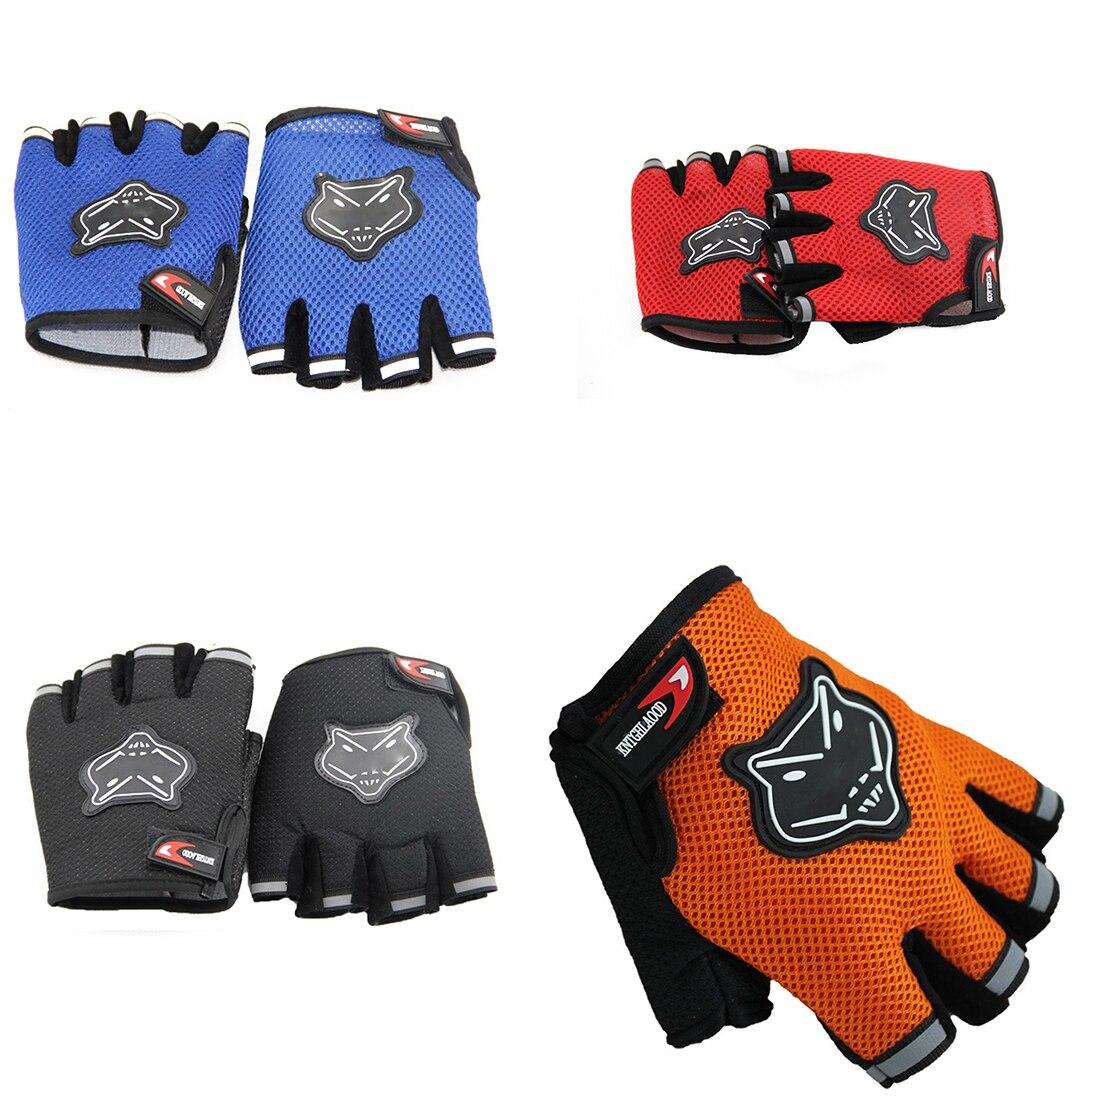 Sale Exercise Anti Slip Weight Lifting Gloves  Sports Gym Gloves Men Fitness Training Half Finger Body Workout Men Women Glove